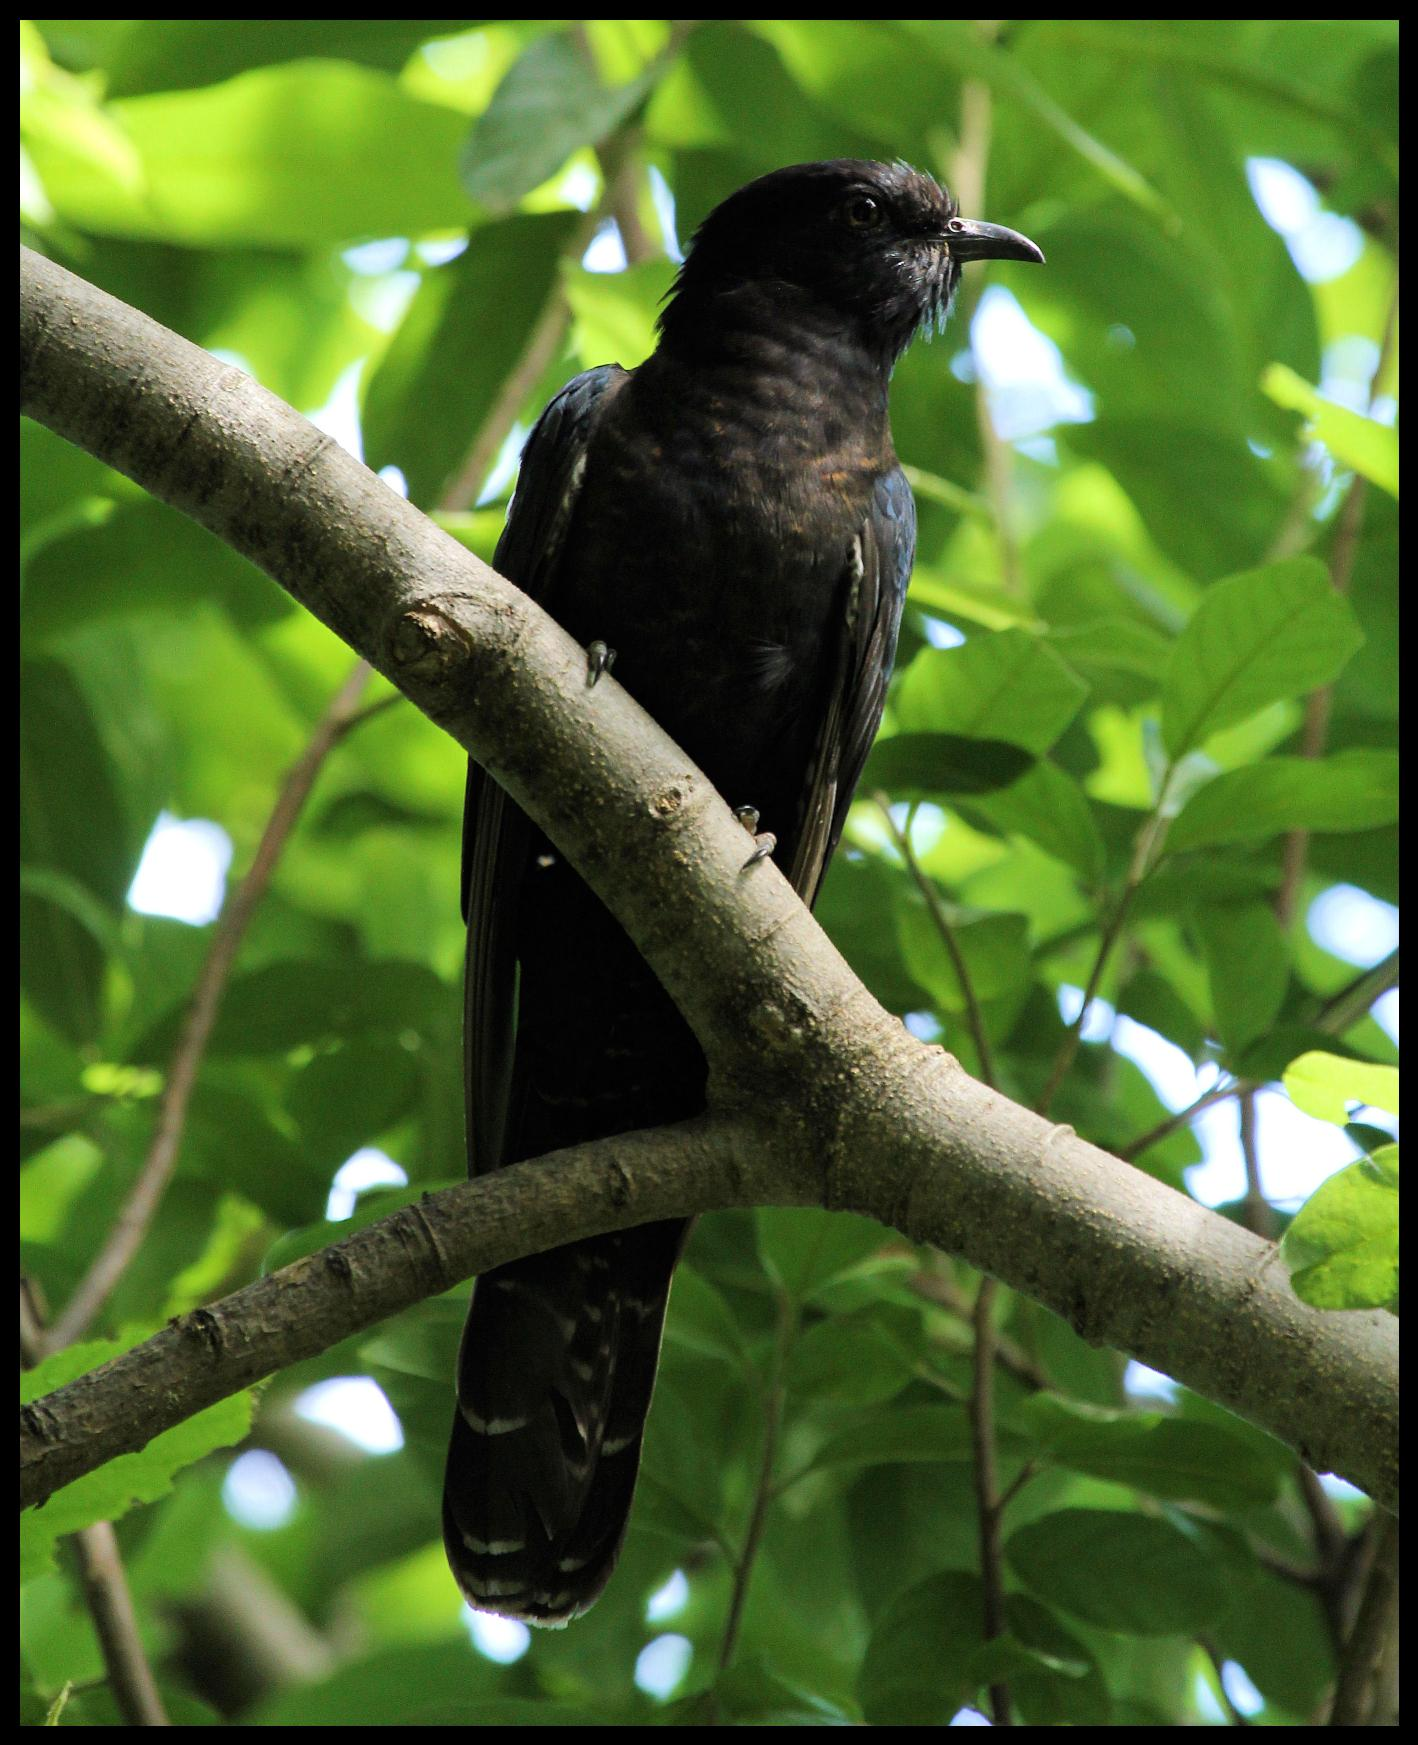 Black cuckoo bird - photo#10